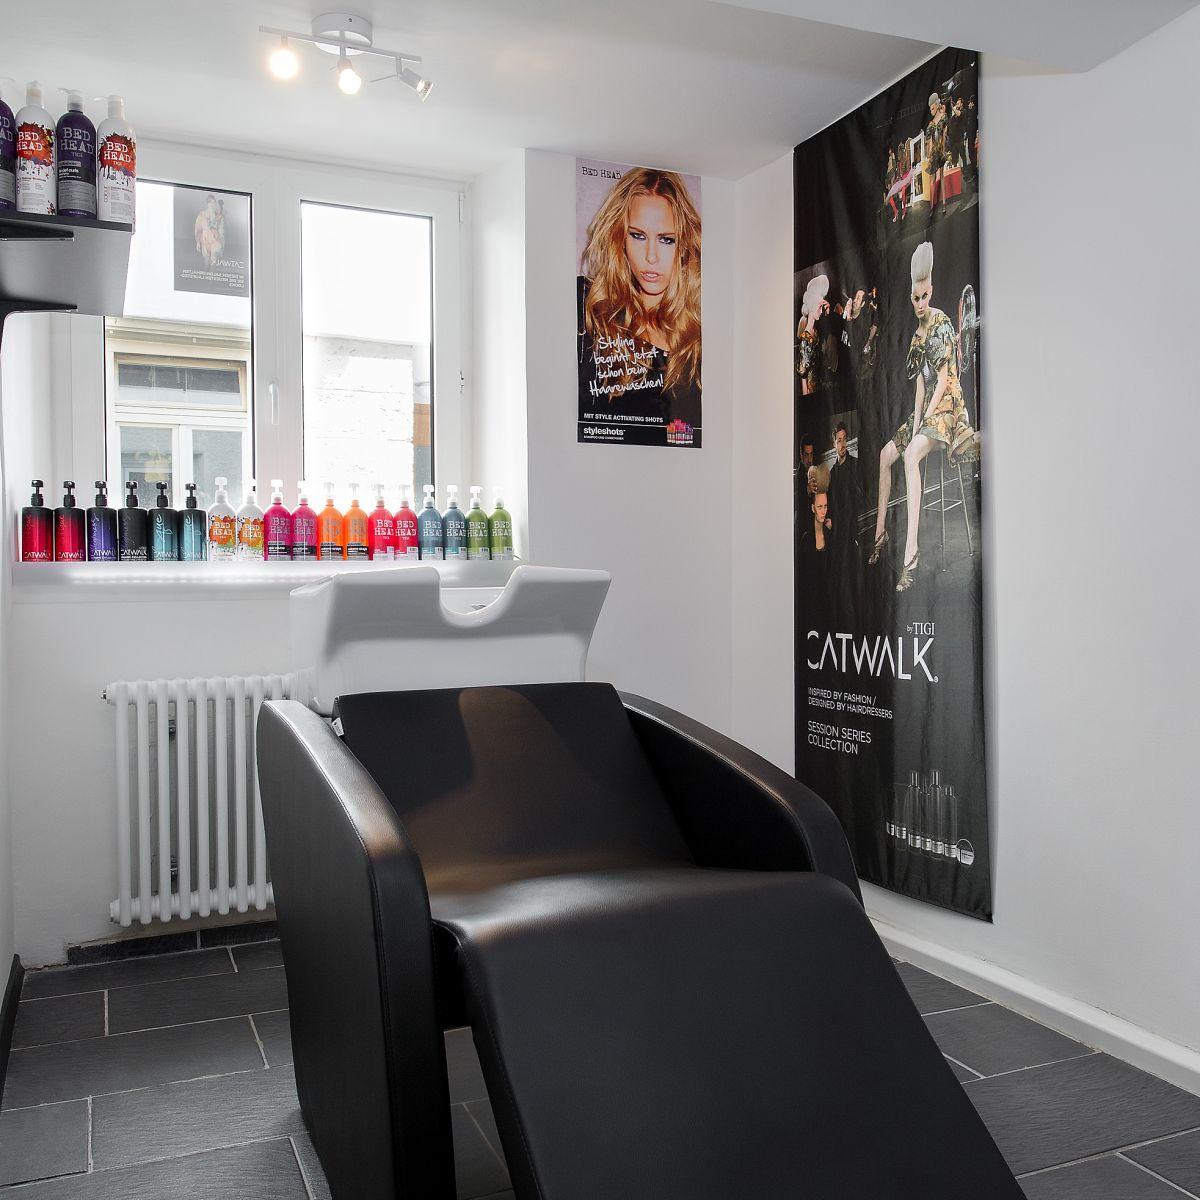 Salon de coiffure shampoo lyon coiffures f minines et - Salon de coiffure lyon ...